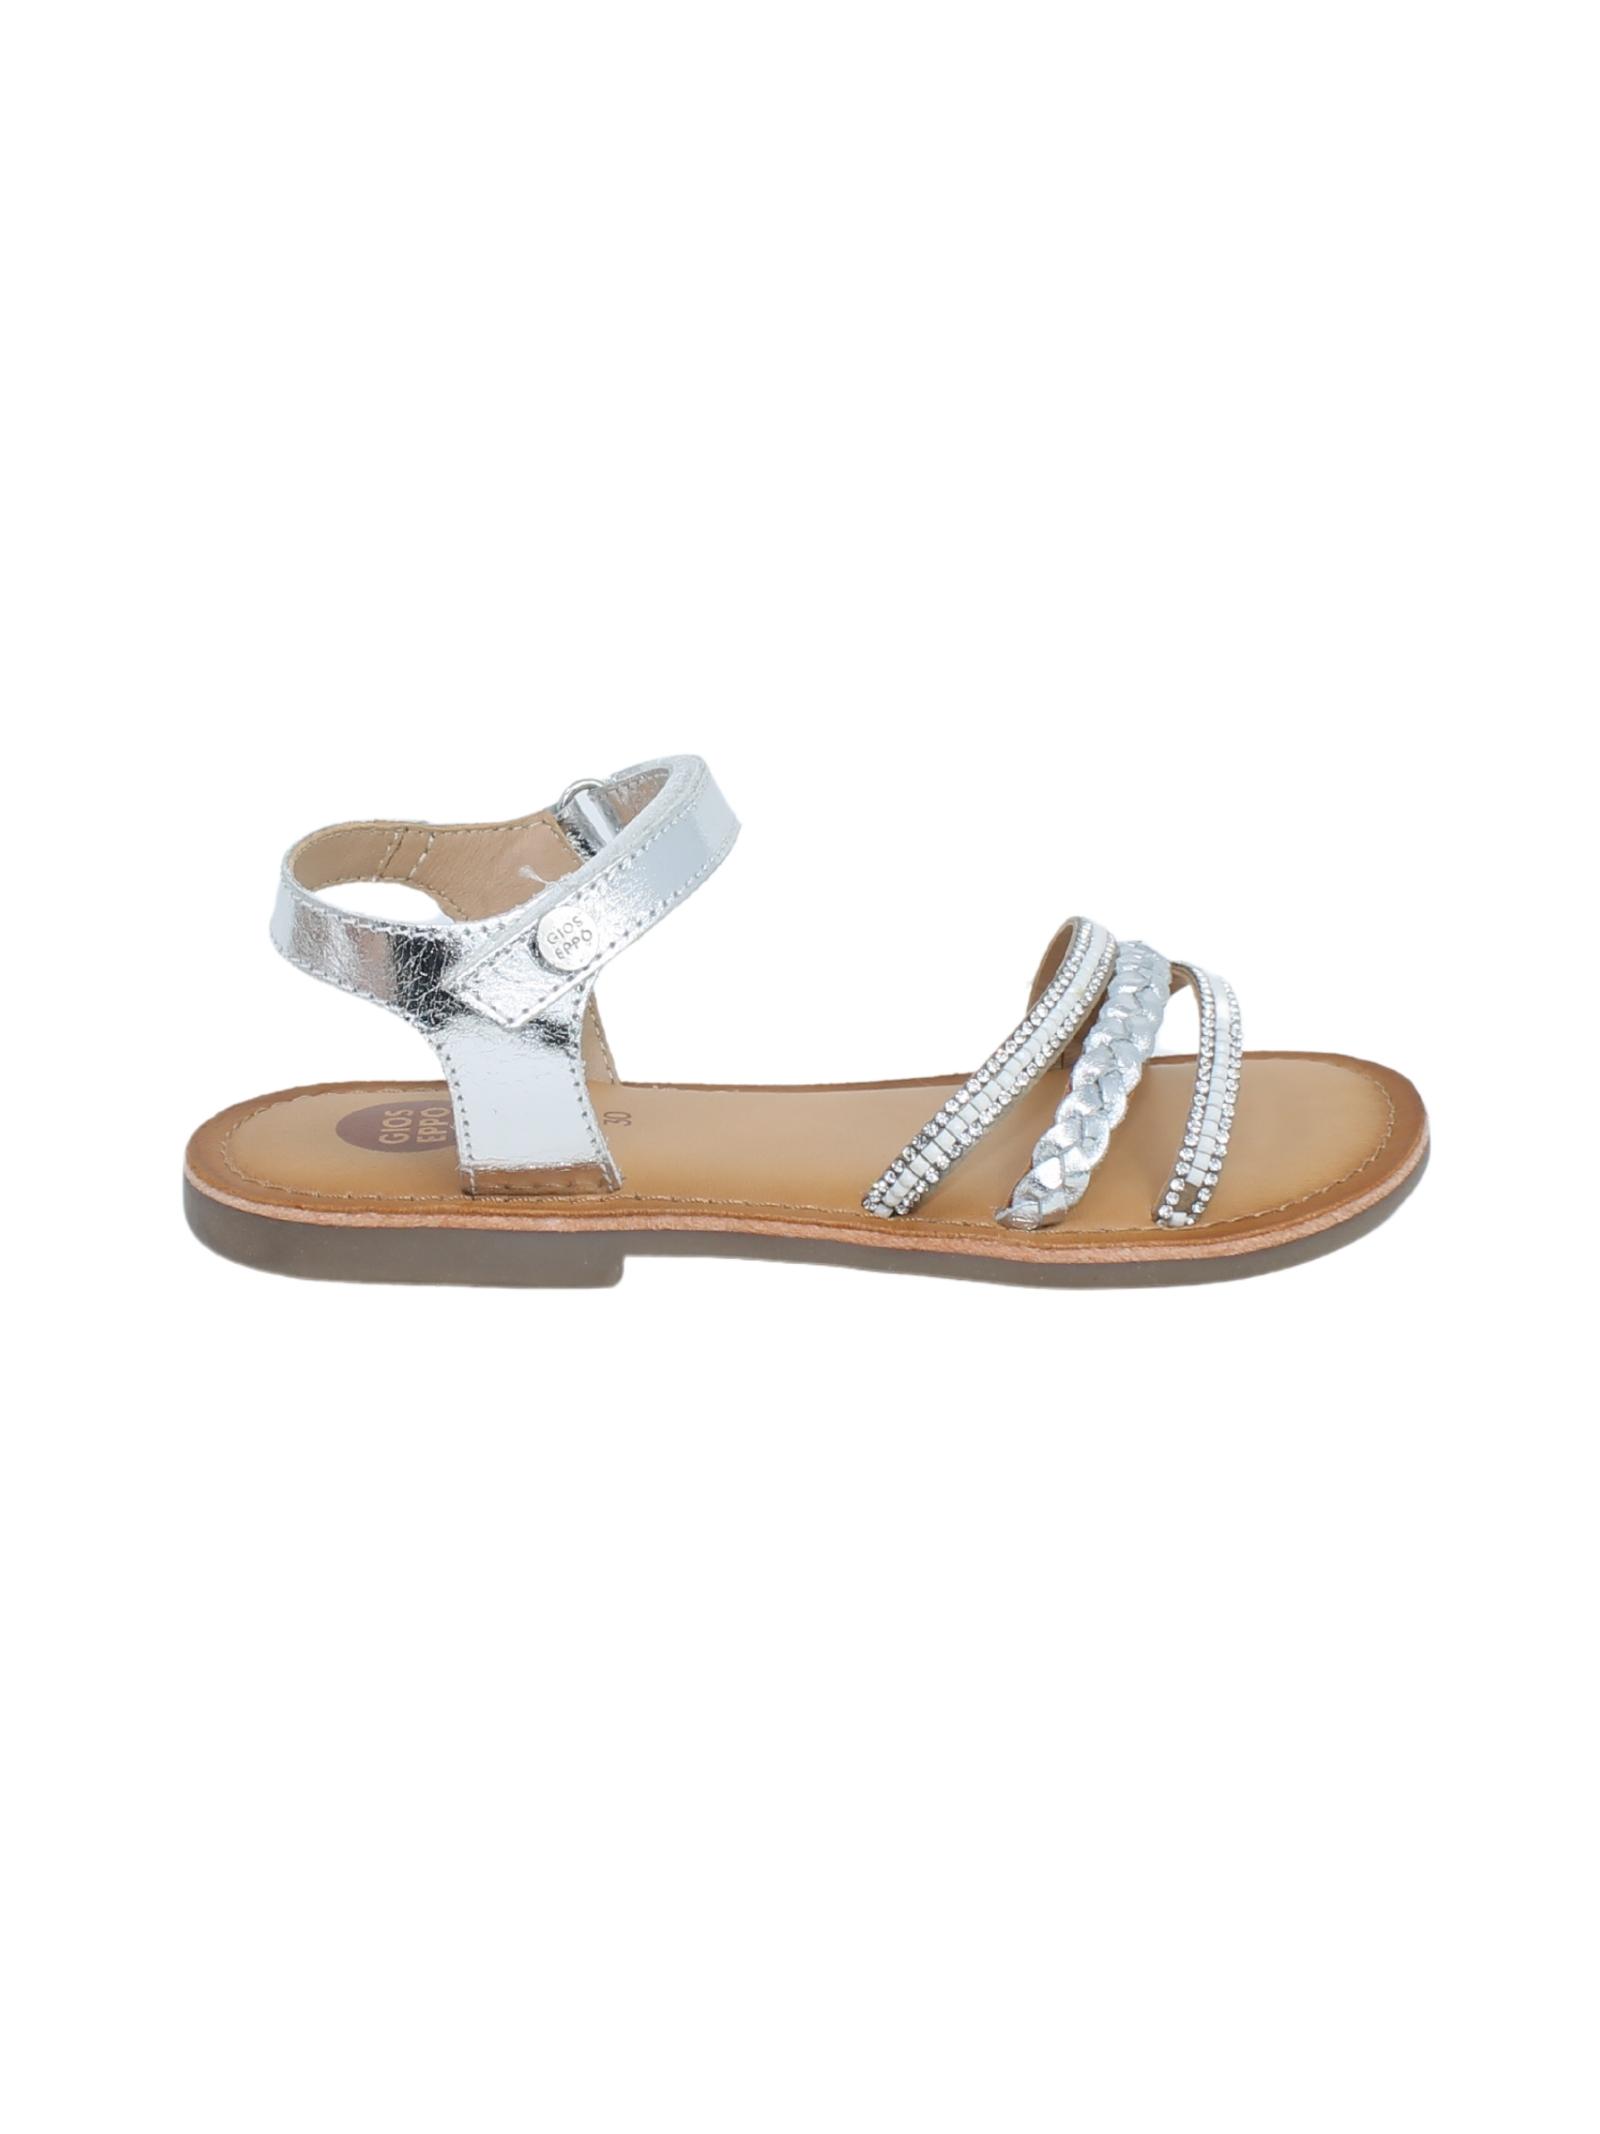 GIOSEPPO KIDS | Sandals | 62987ARGENTO